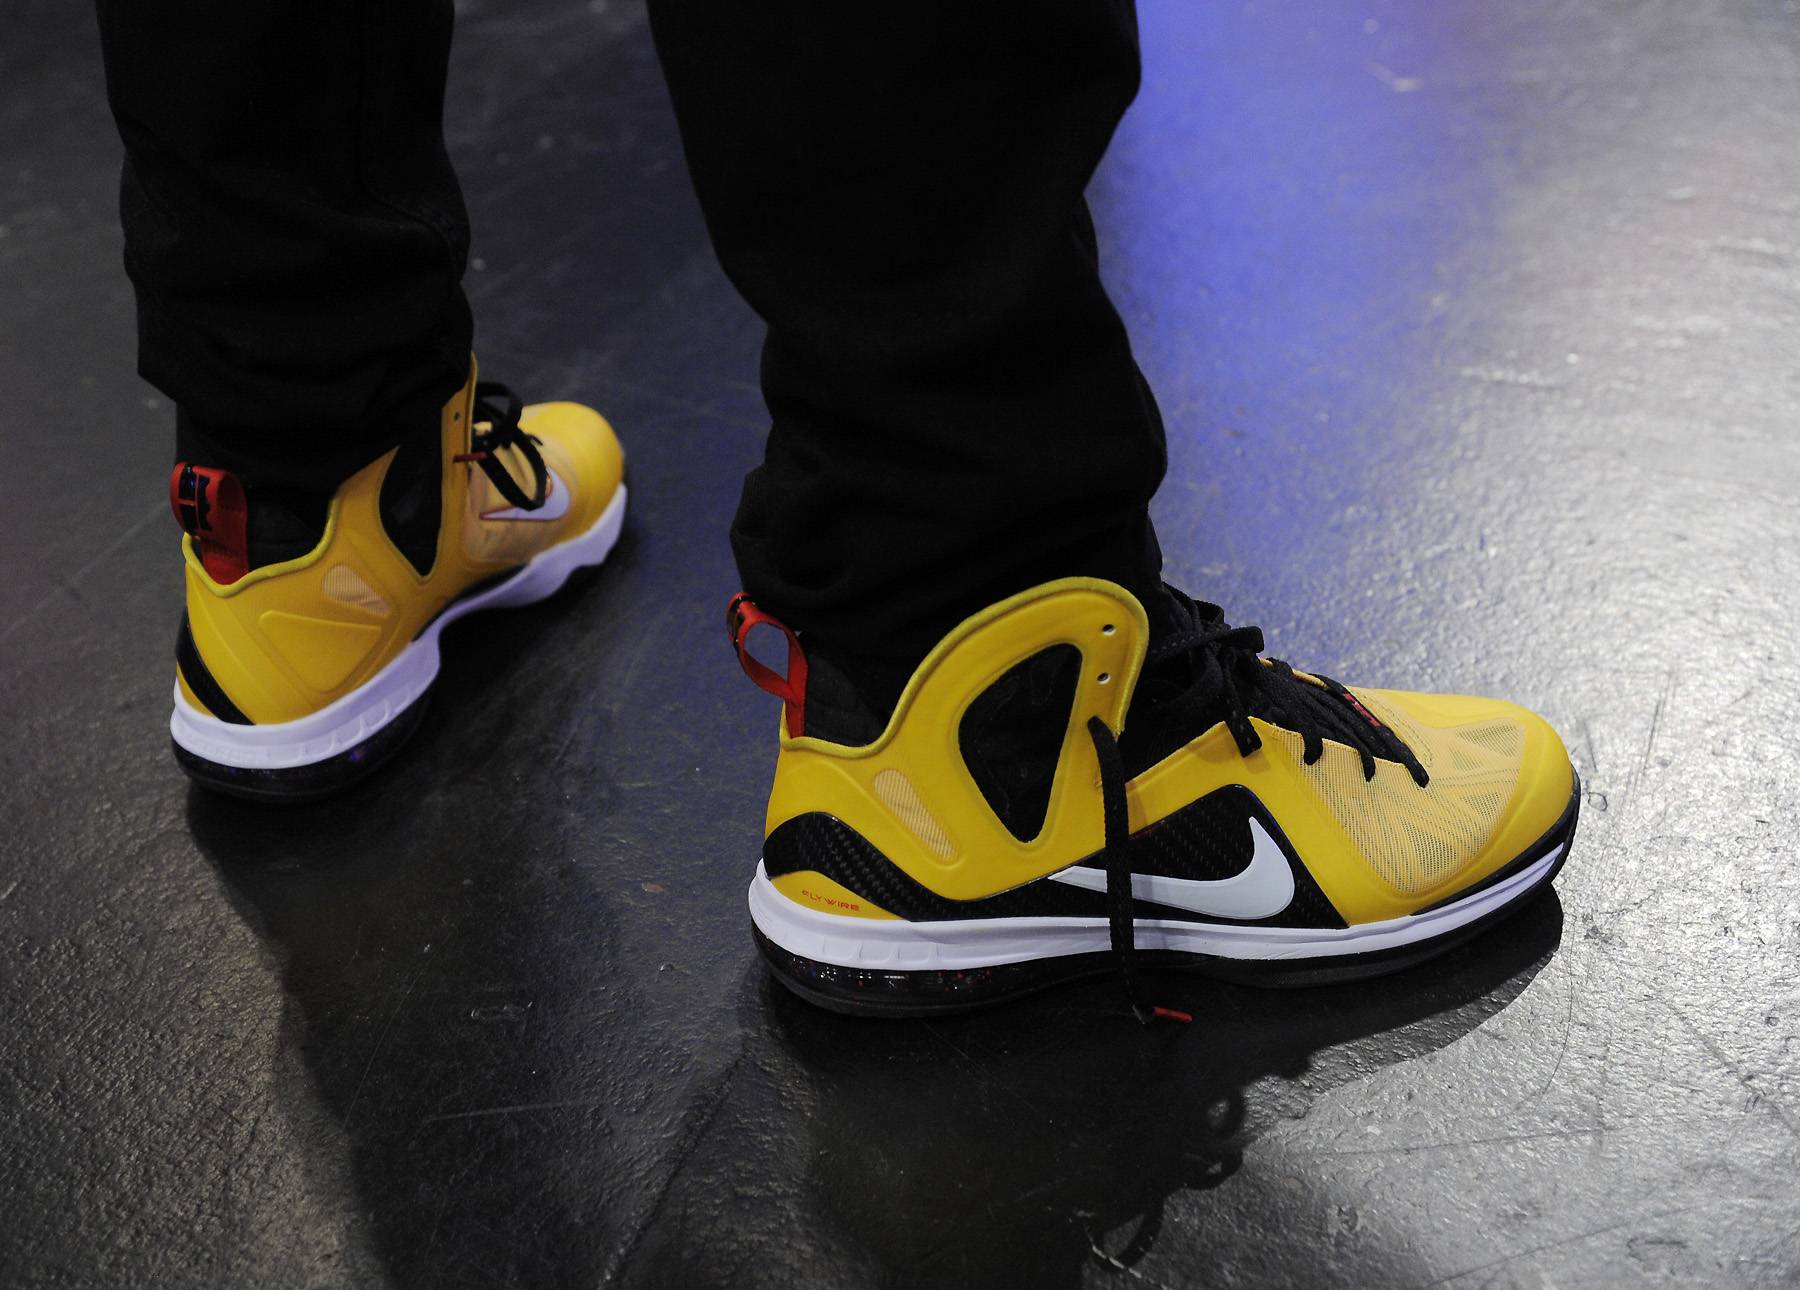 Nice Sneakers - Terrence J at 106 & Park, April 9, 2012. (photo: John Ricard / BET)